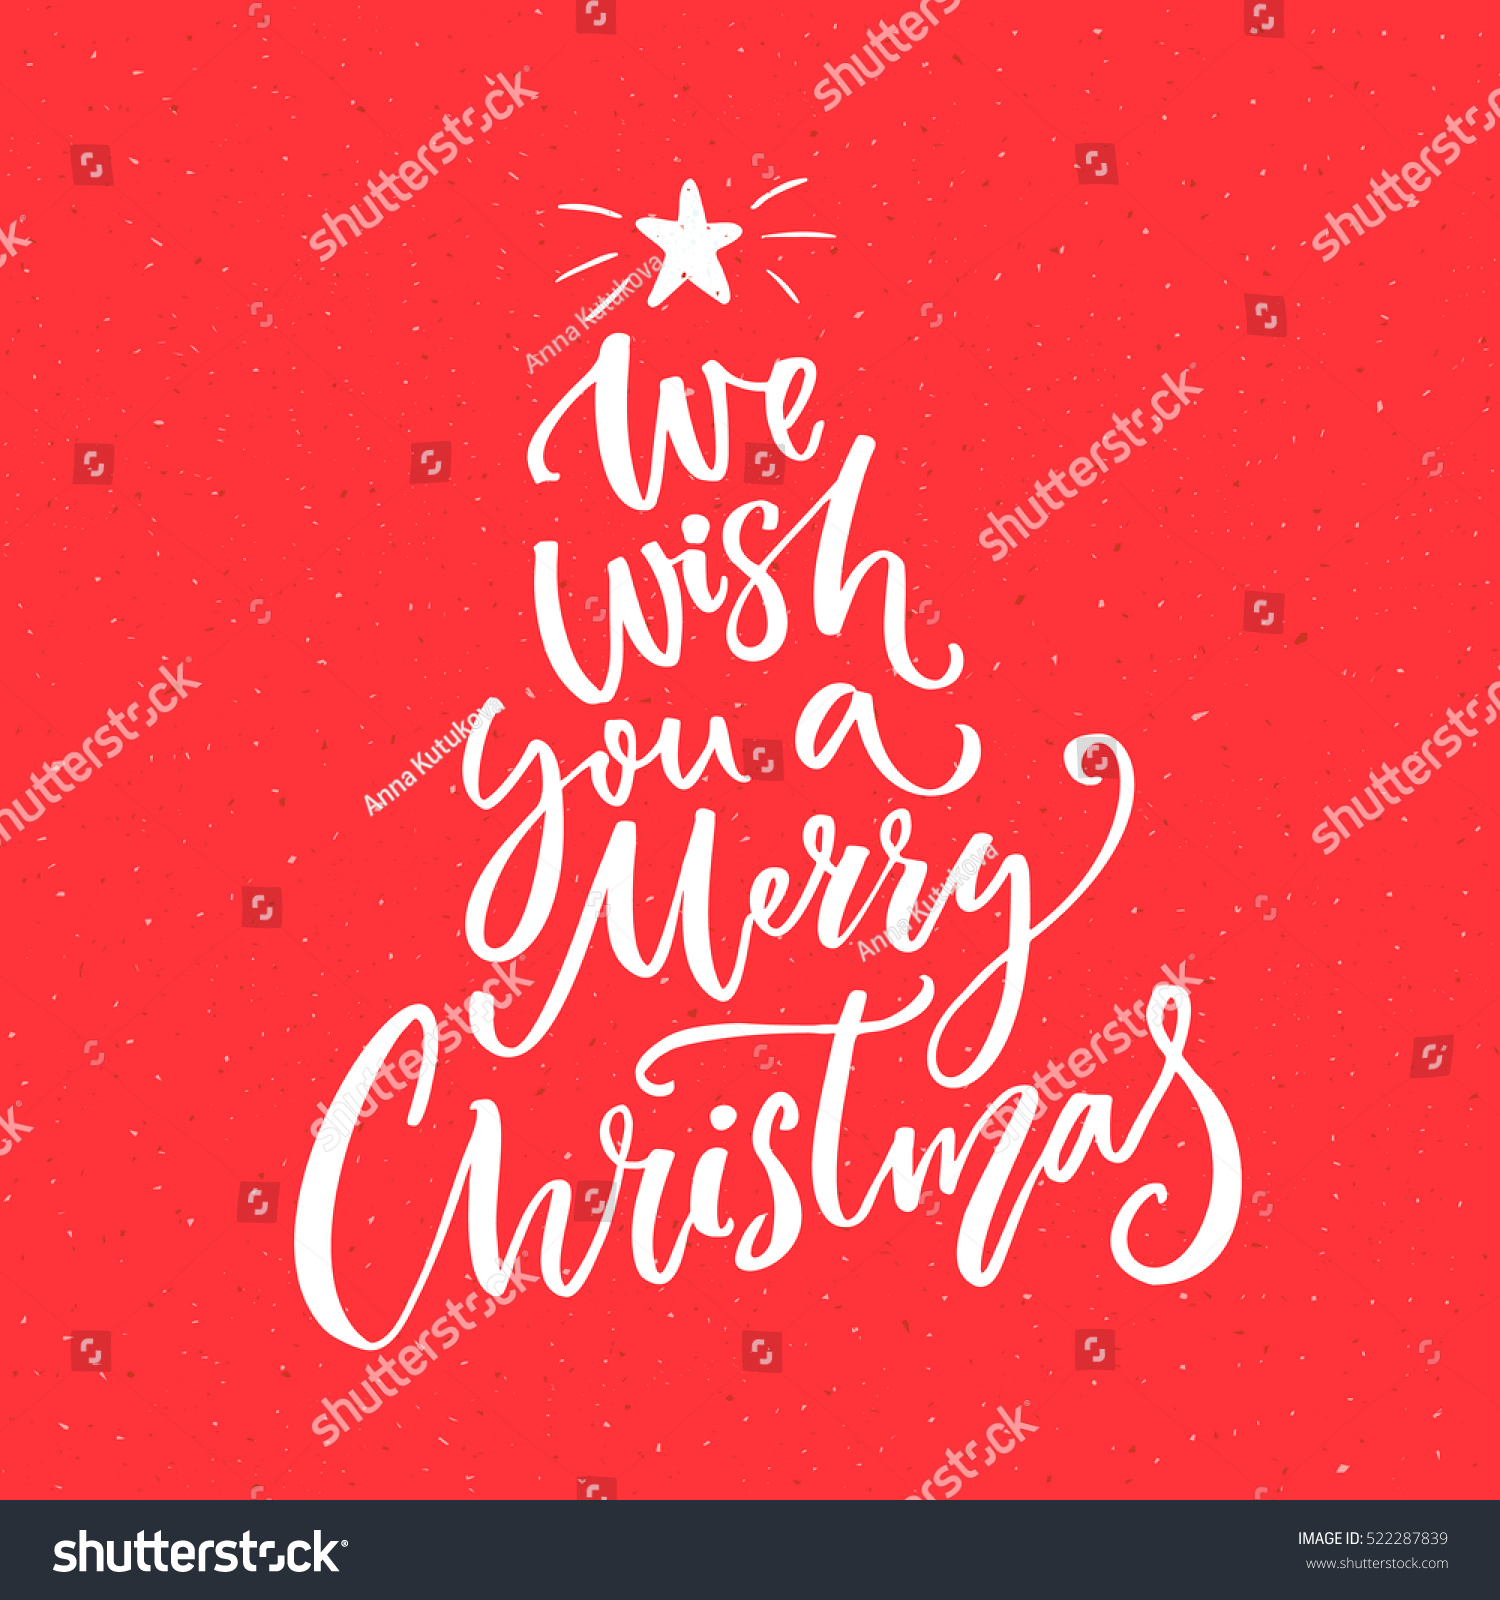 We Wish You Merry Christmas Text Stock-Vektorgrafik (Lizenzfrei ...